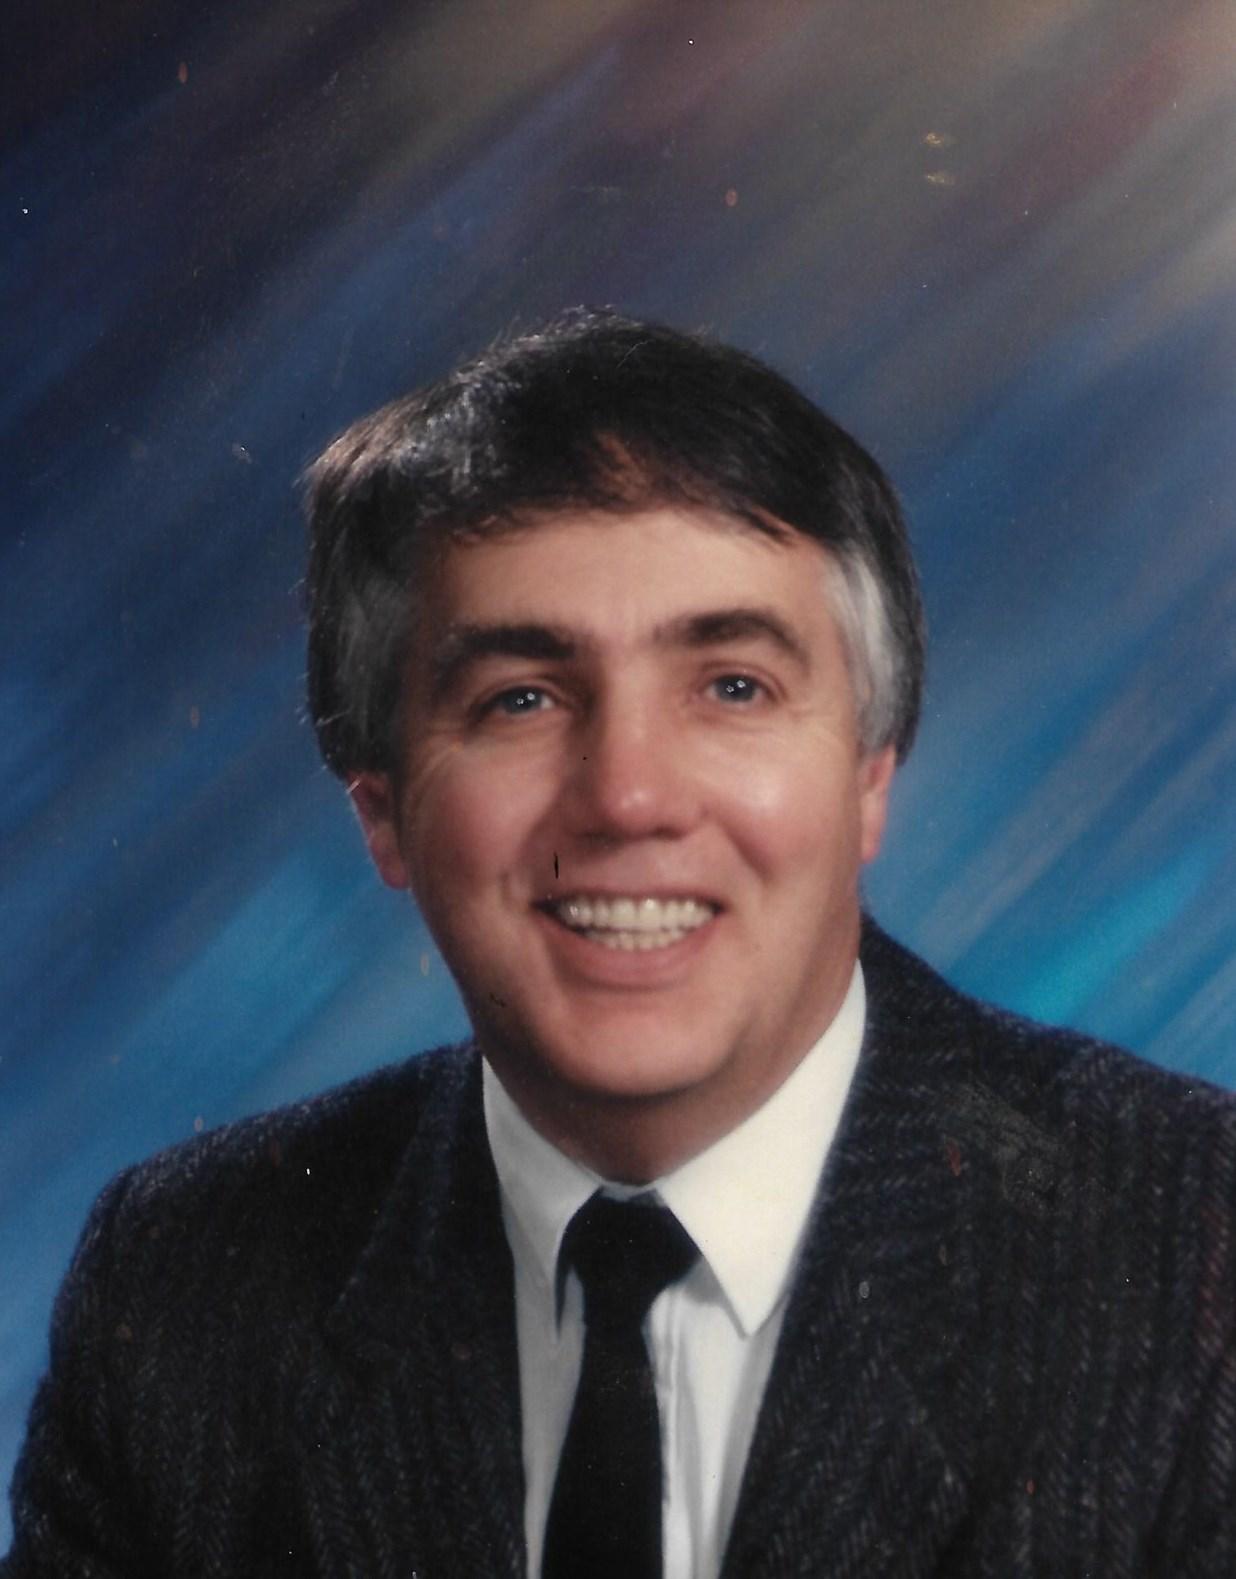 Andrea Allan allan macdougall obituary - sydney, ns